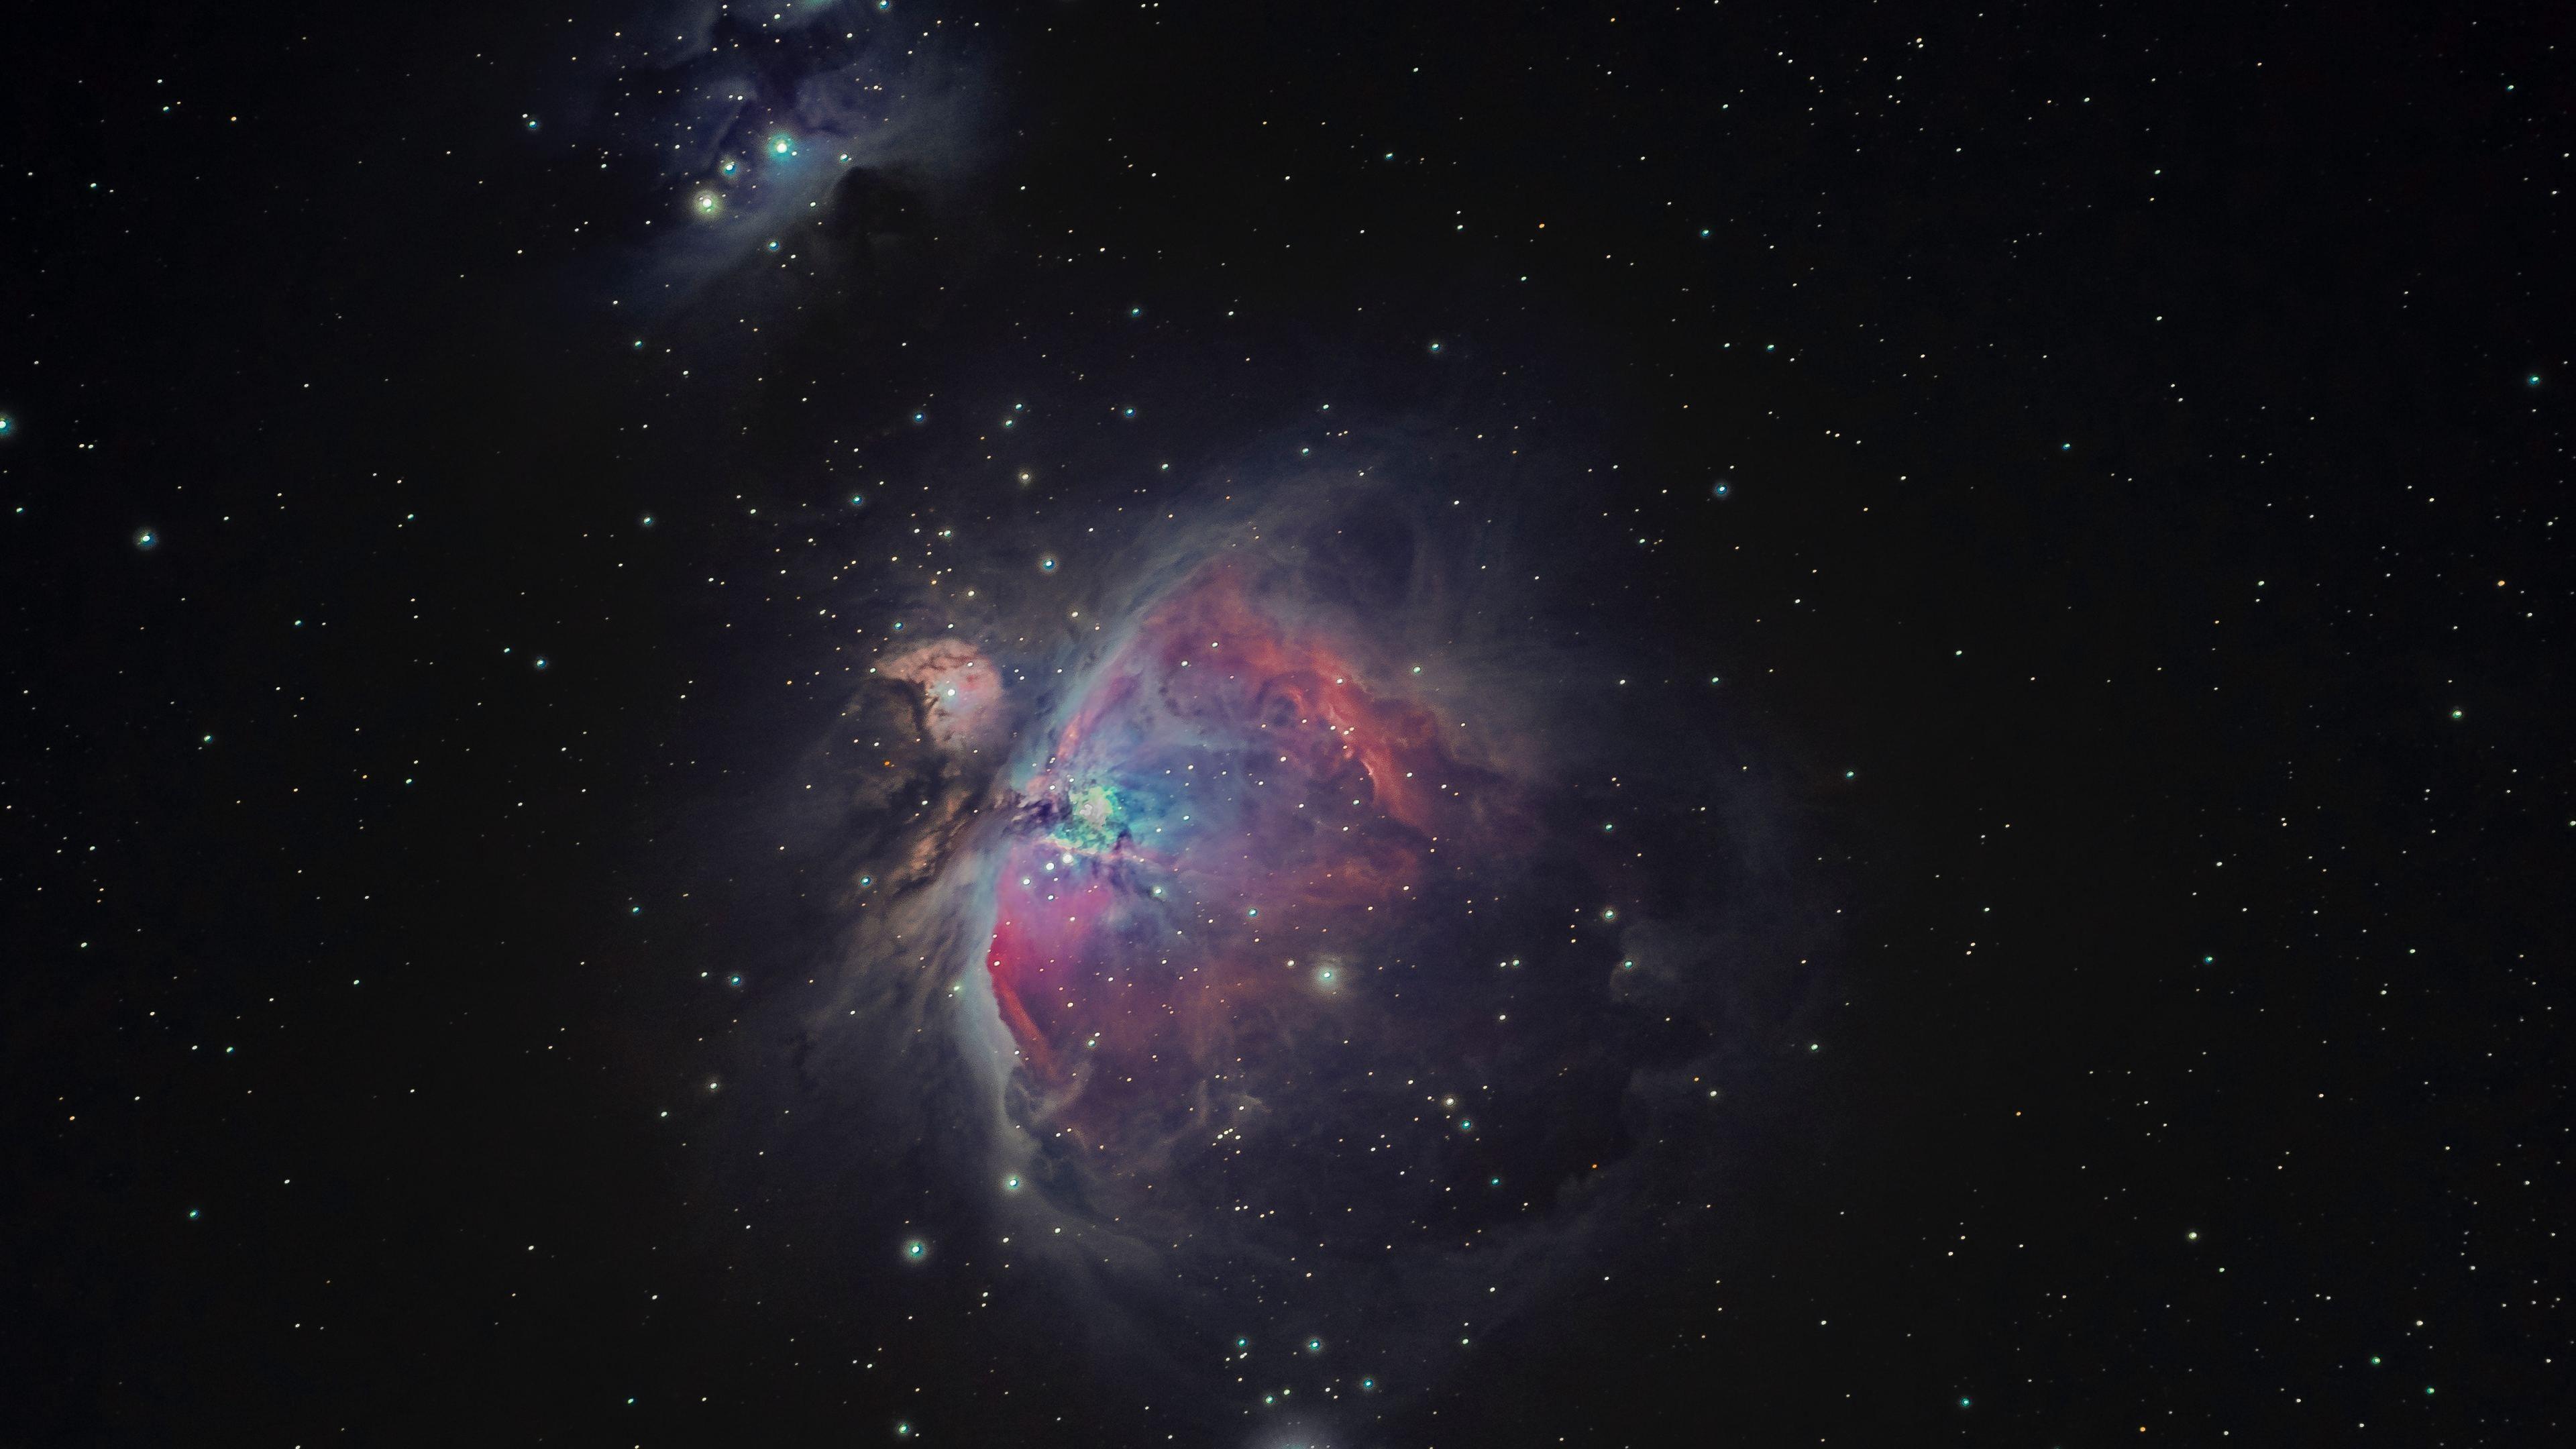 Orion Nebula 4k Wallpaper Orion Nebula Wallpaper Space